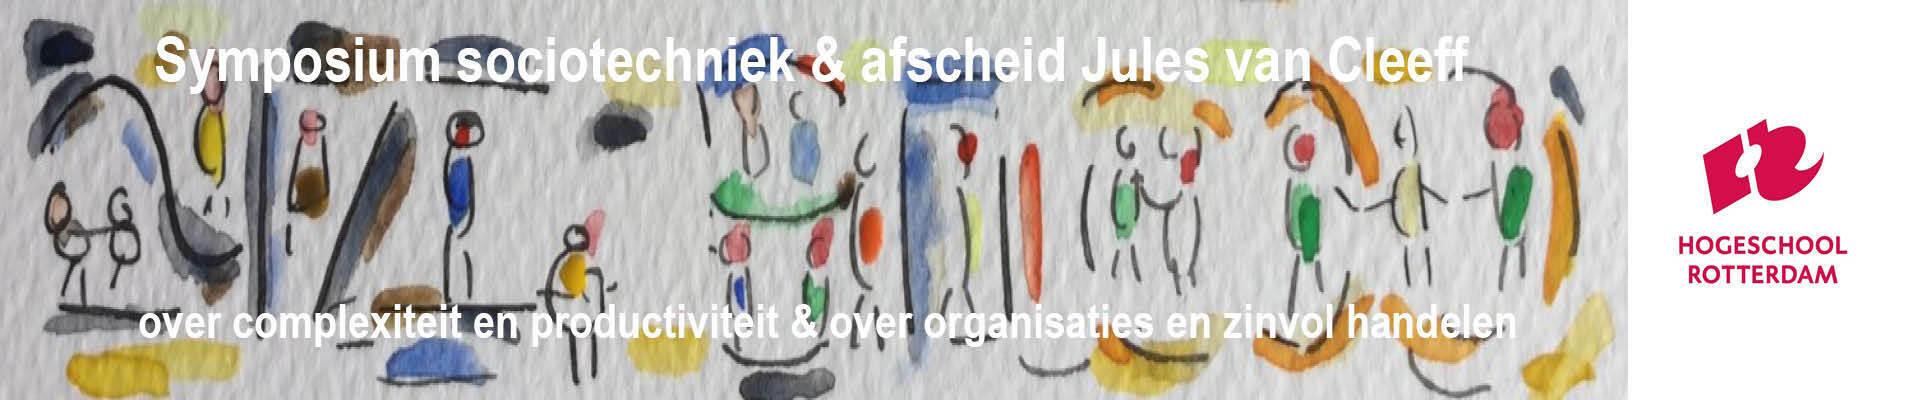 Symposium Sociotechniek | afscheid Jules van Cleeff